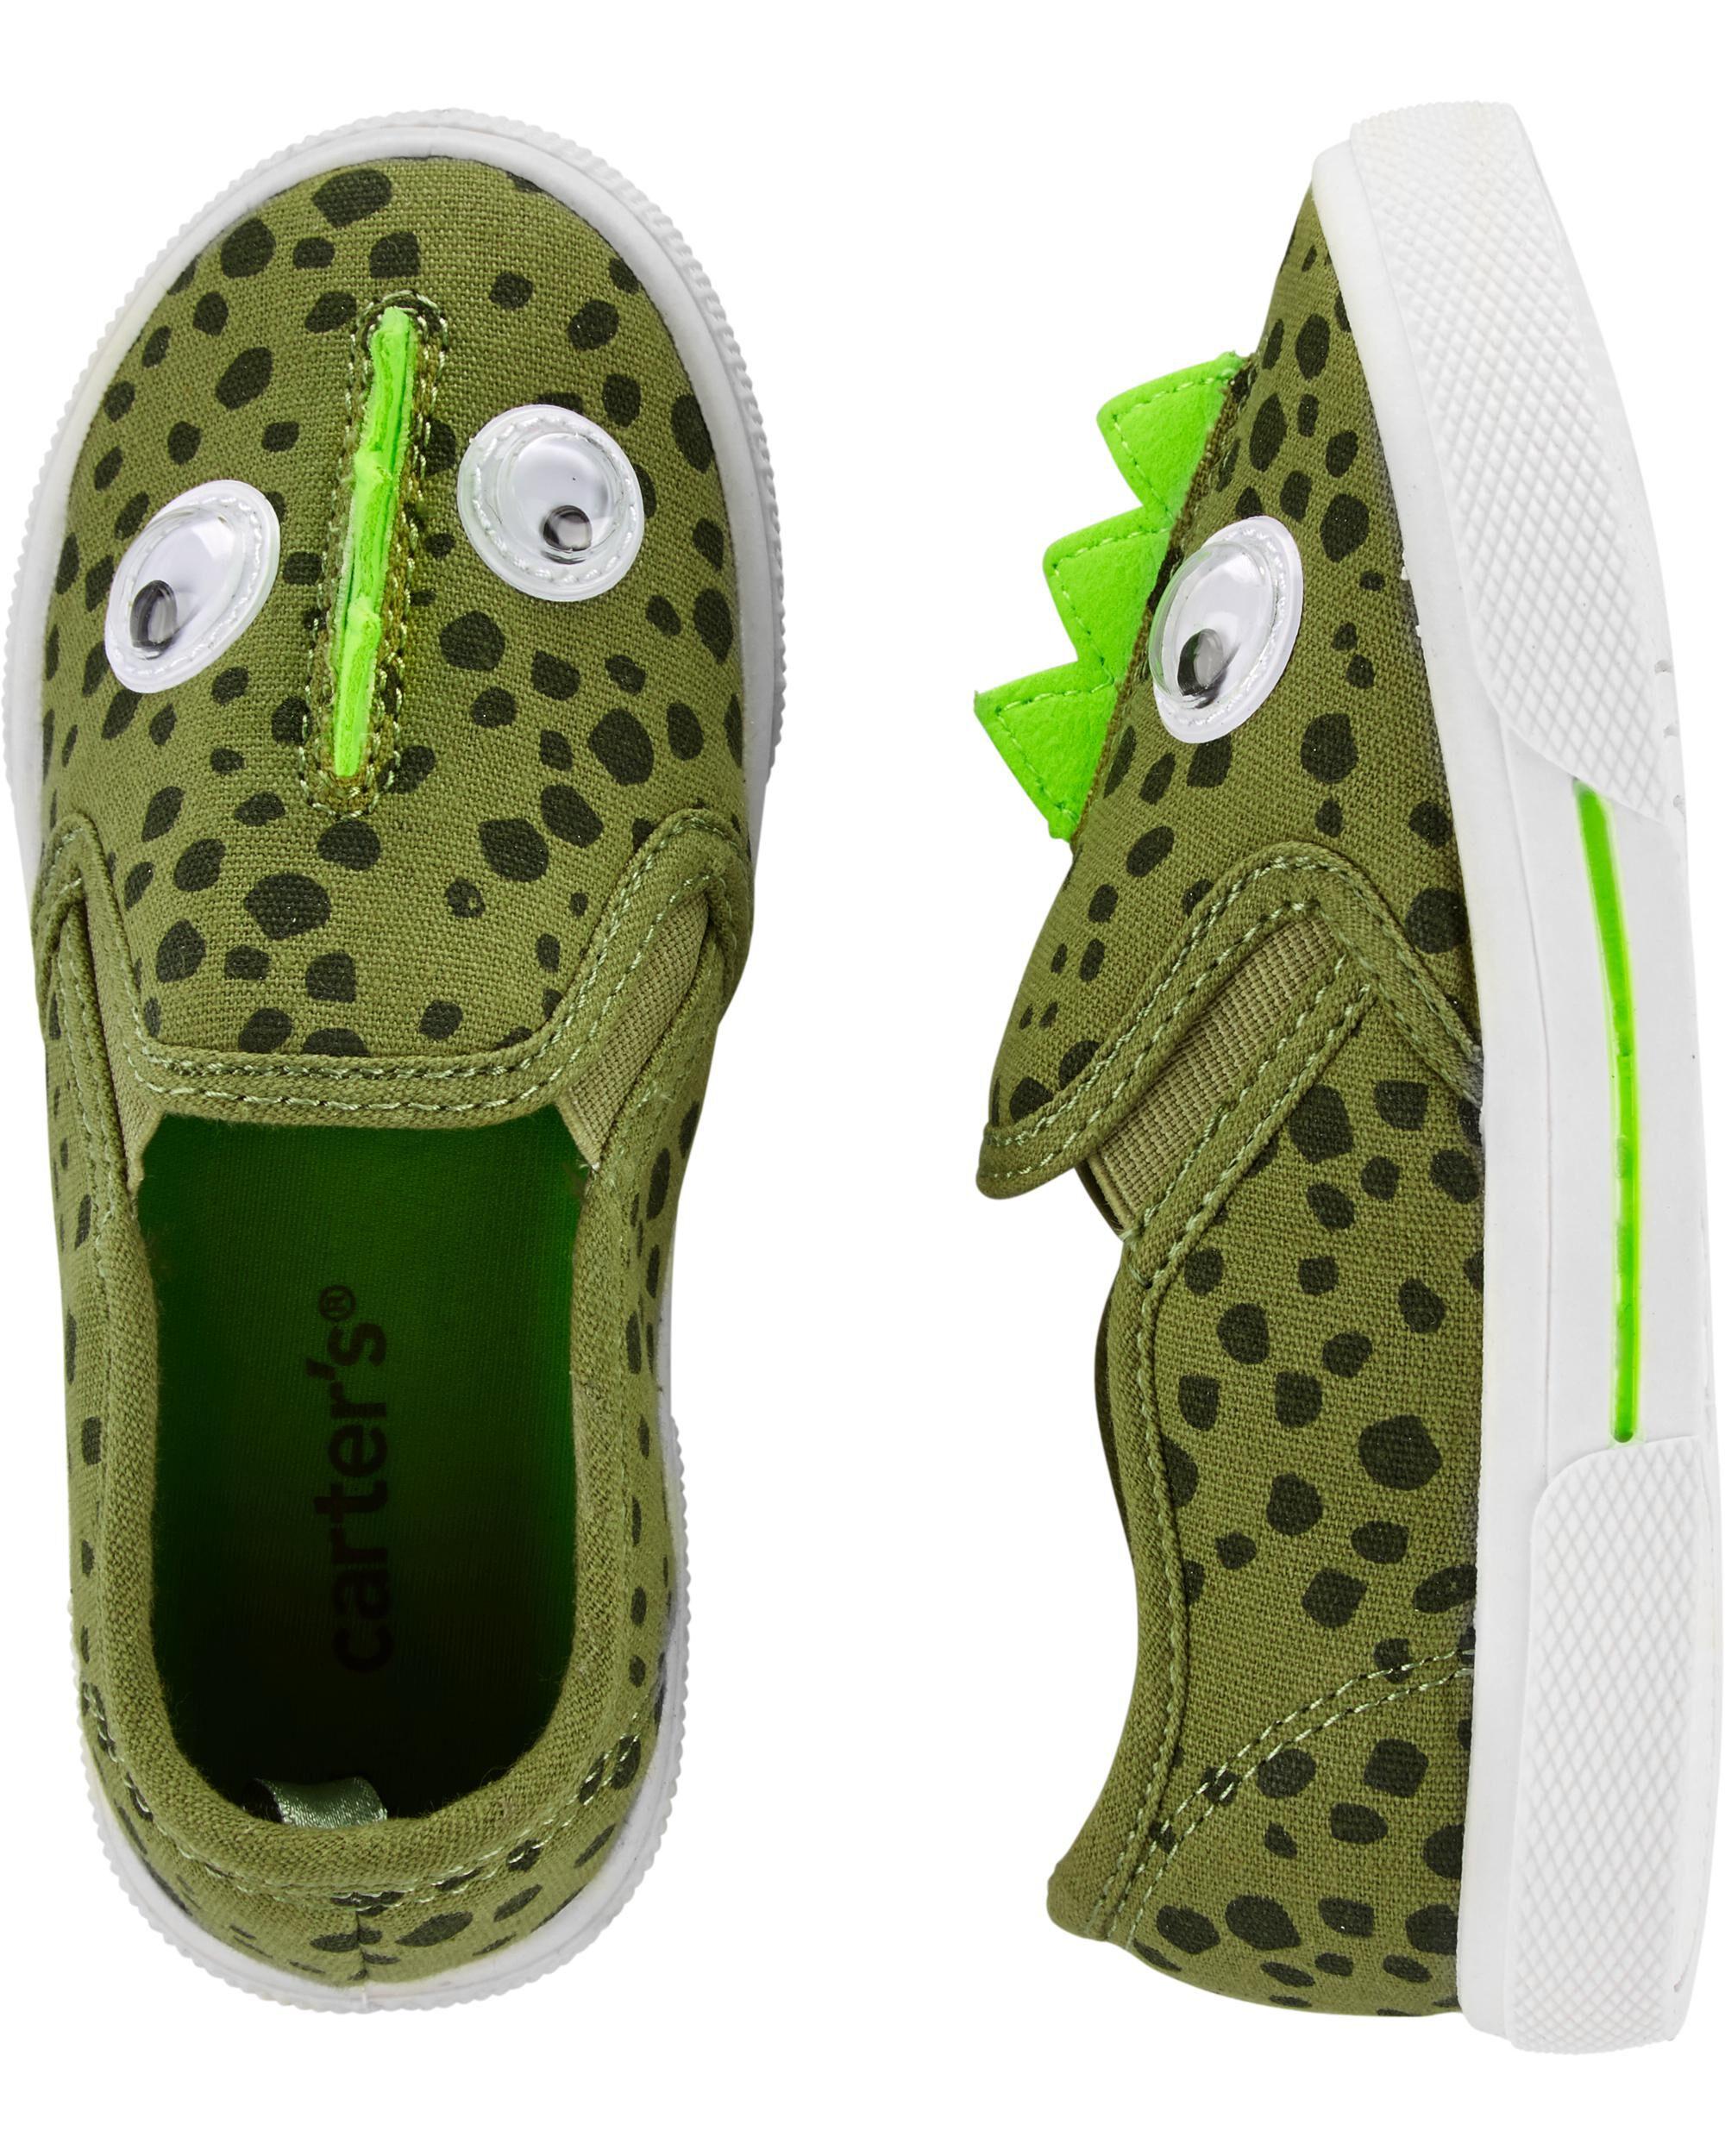 carters dinosaur shoes